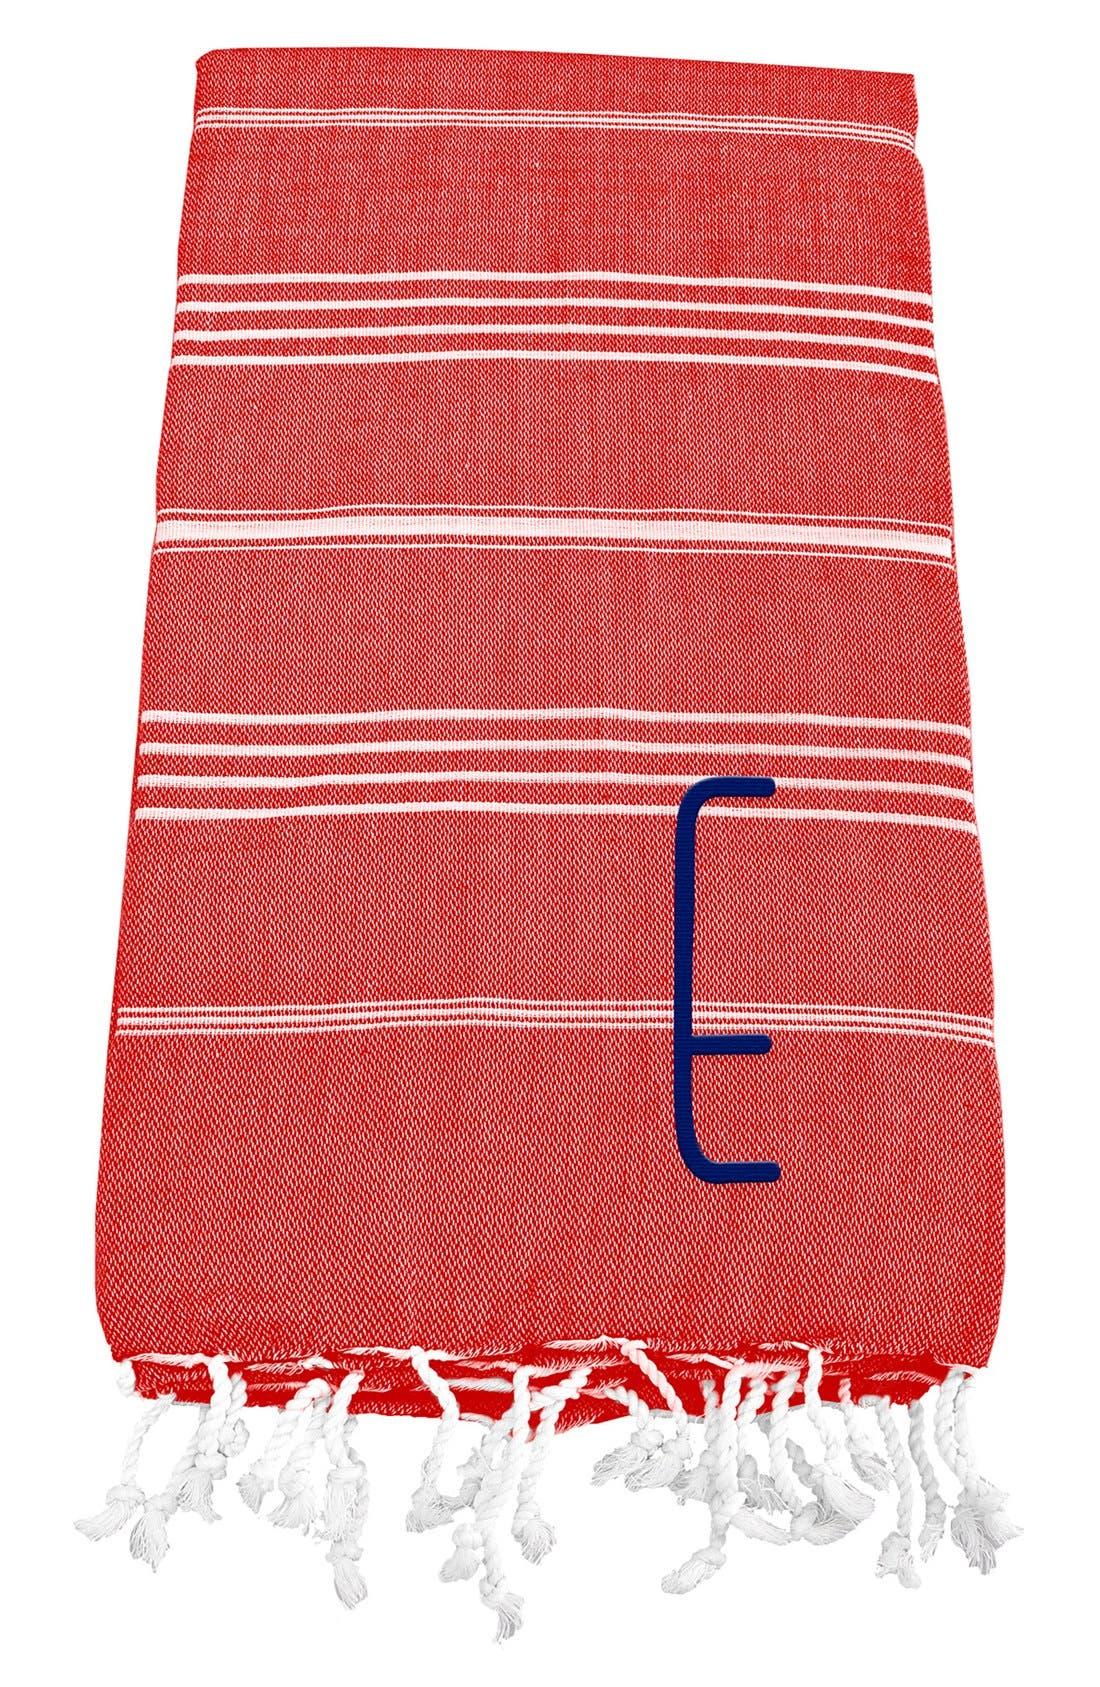 Monogram Turkish Cotton Towel,                             Main thumbnail 114, color,